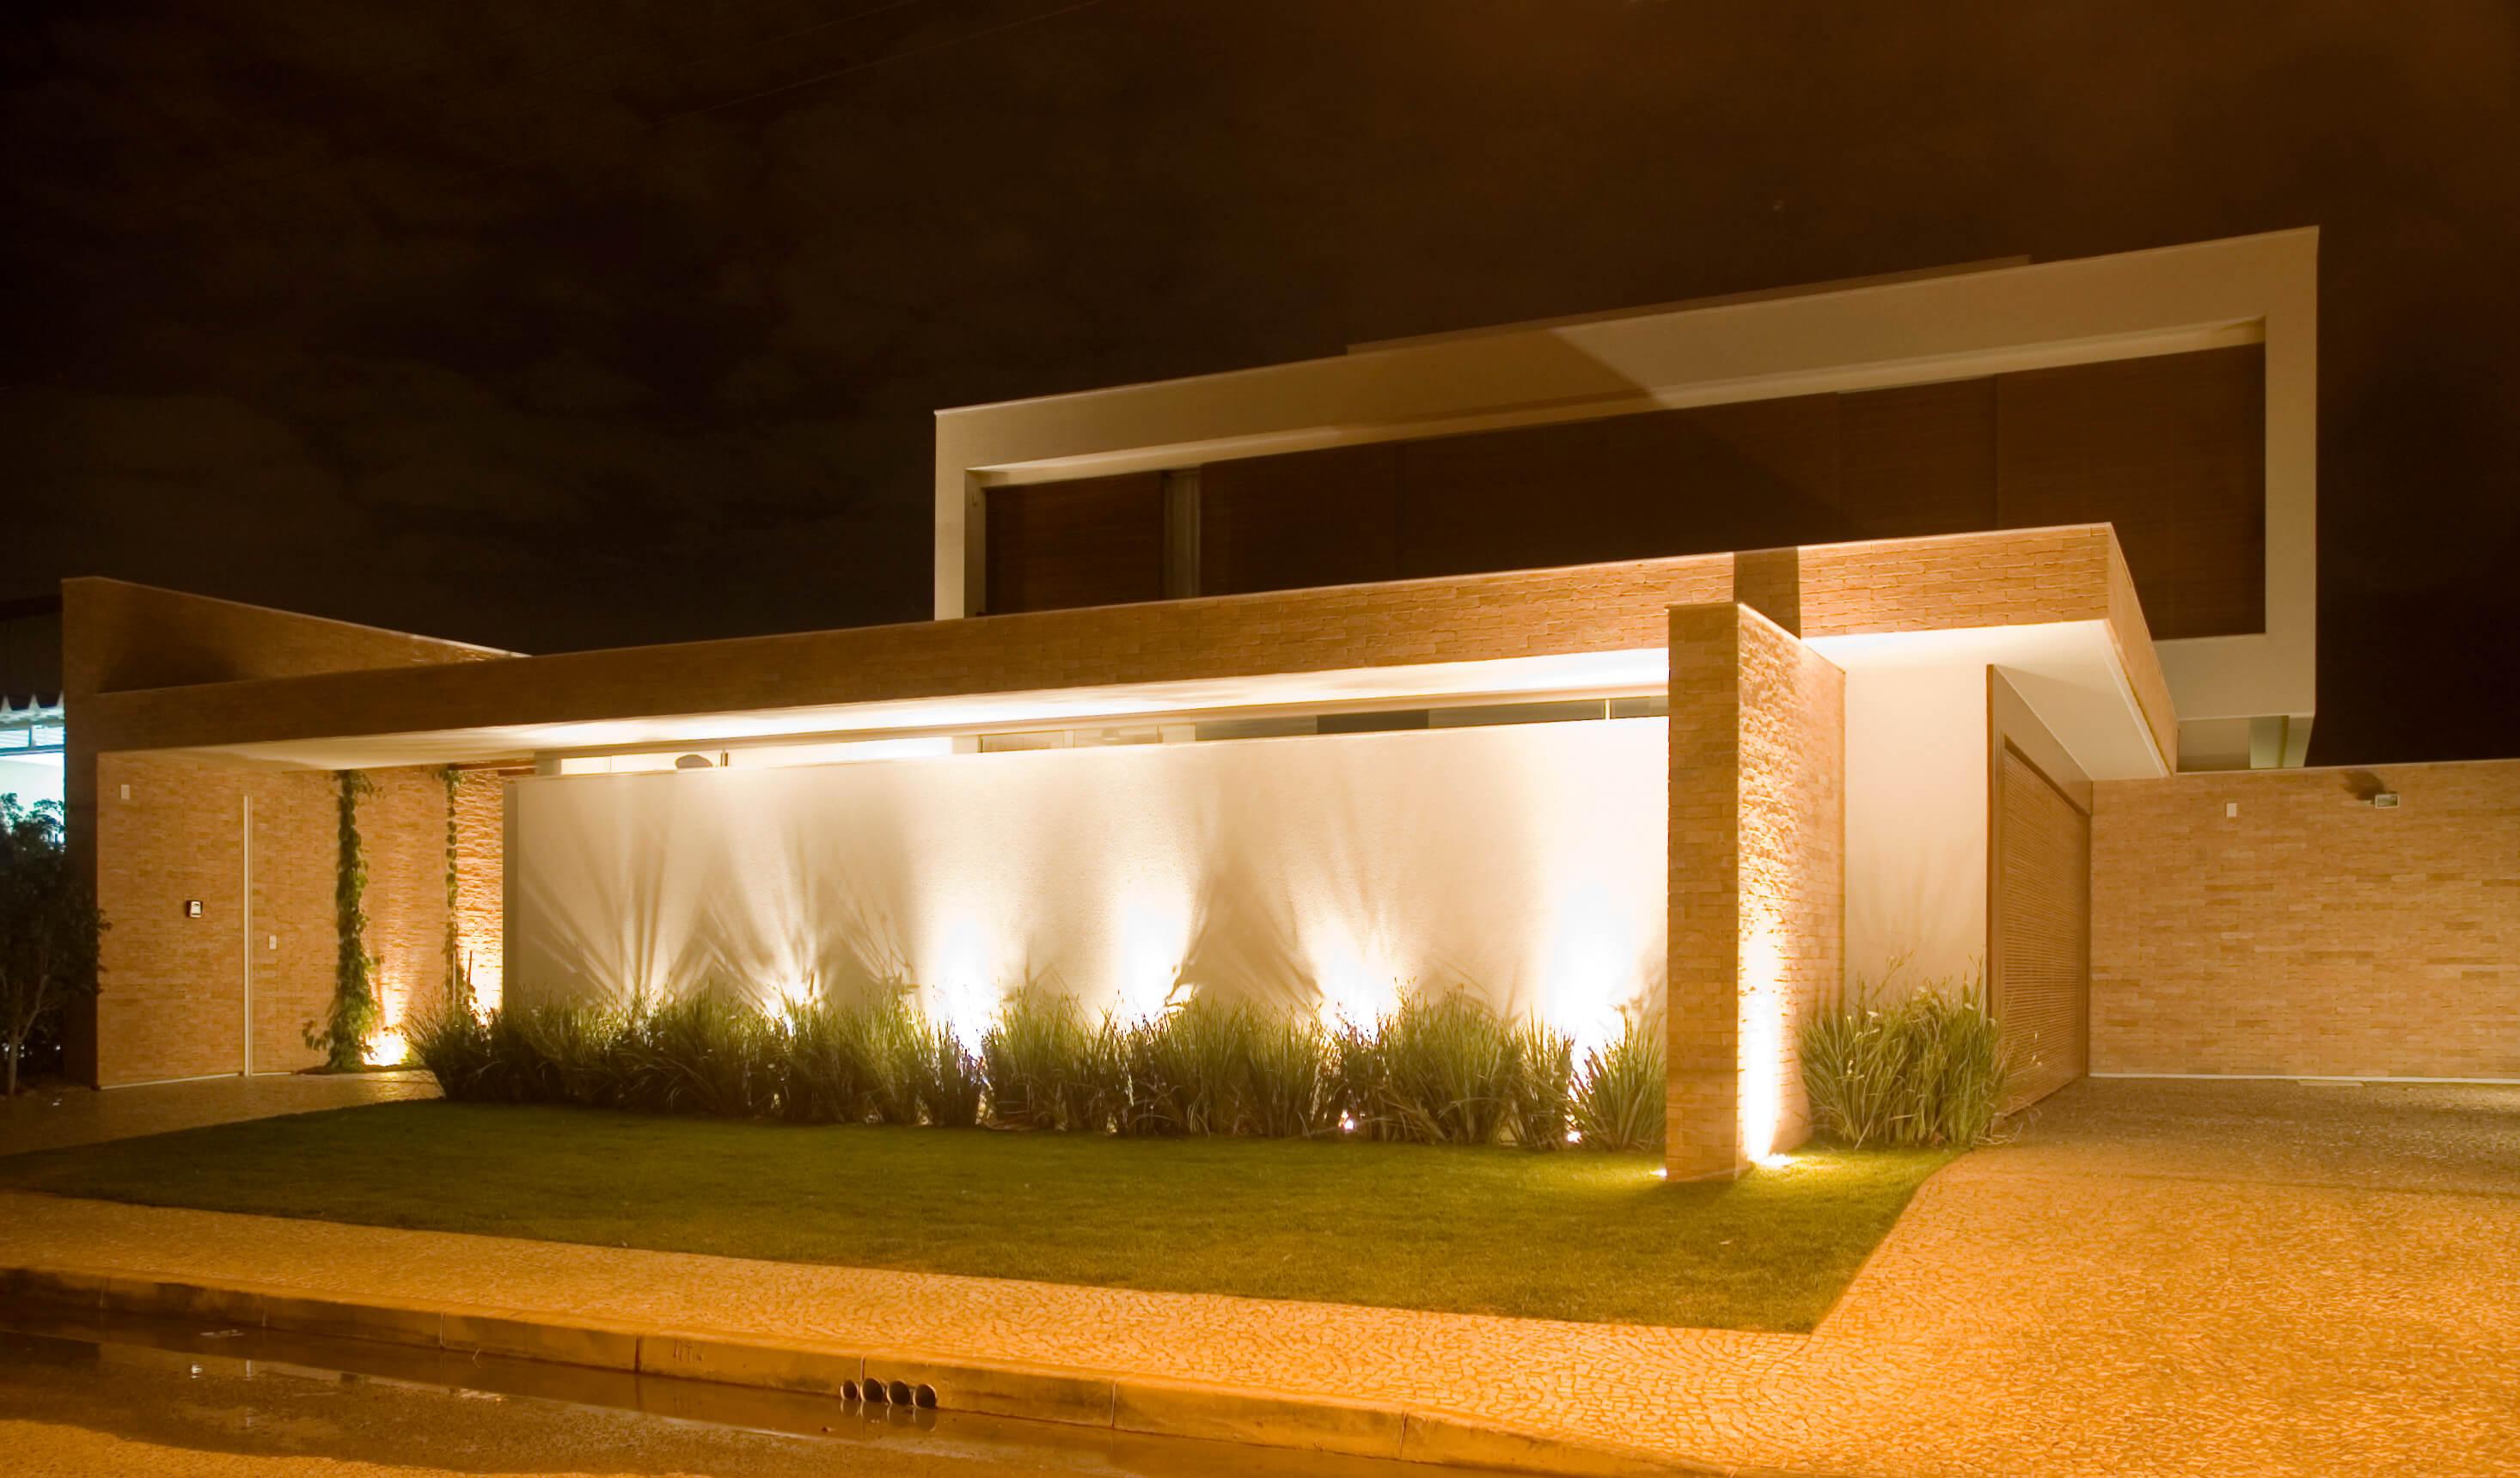 Muro integrado à fachada de projeto residencial